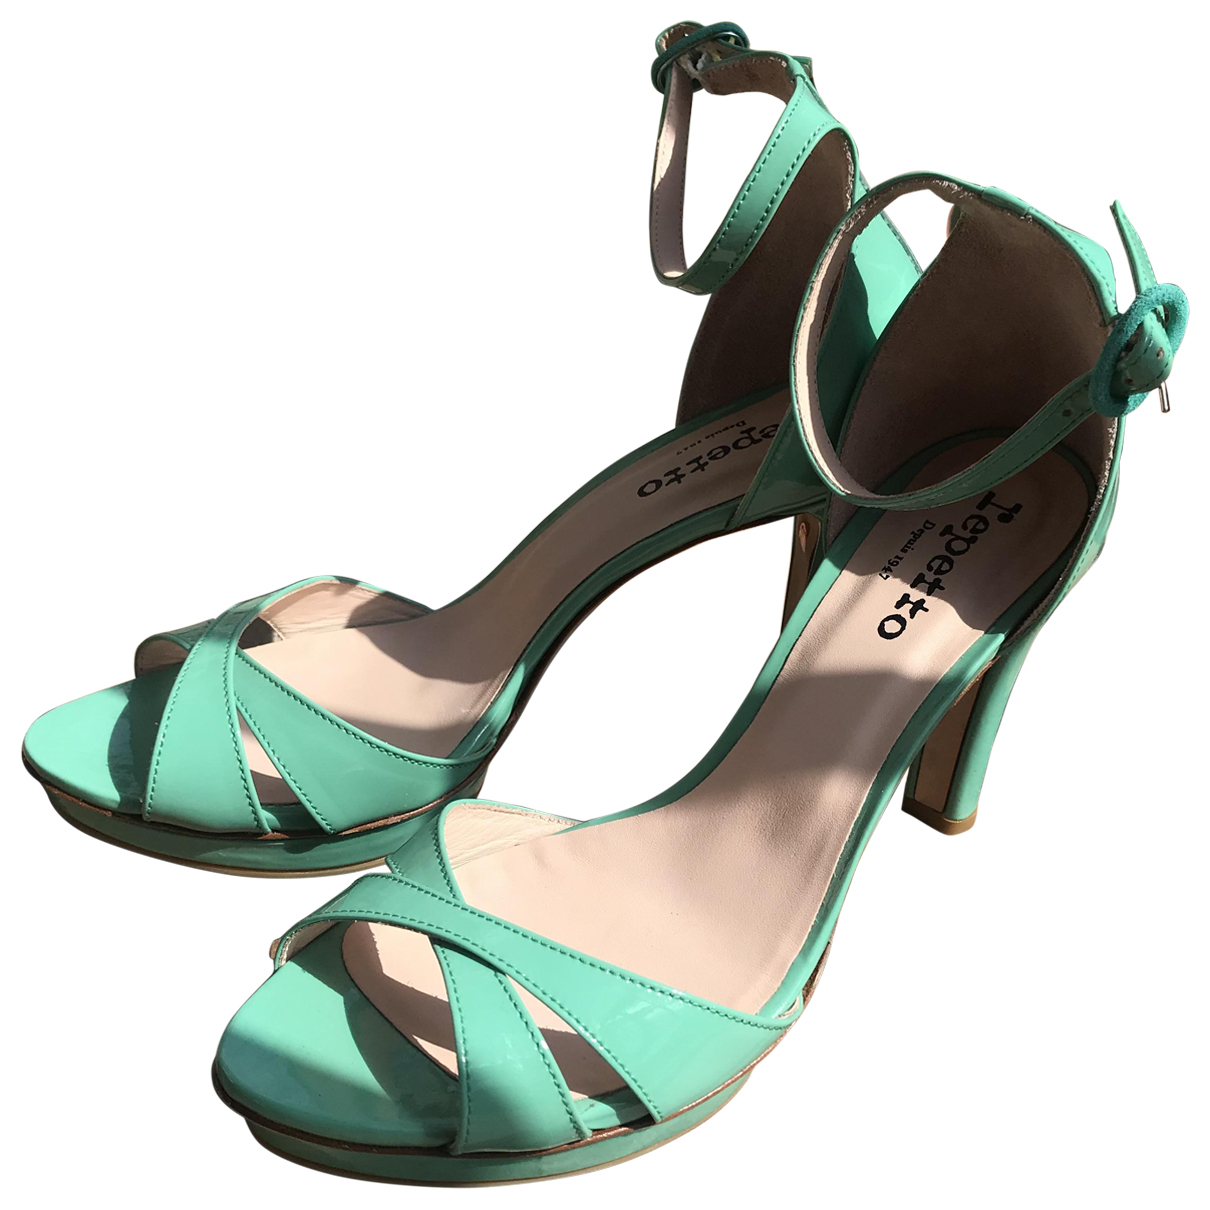 Sandalias de Charol Repetto